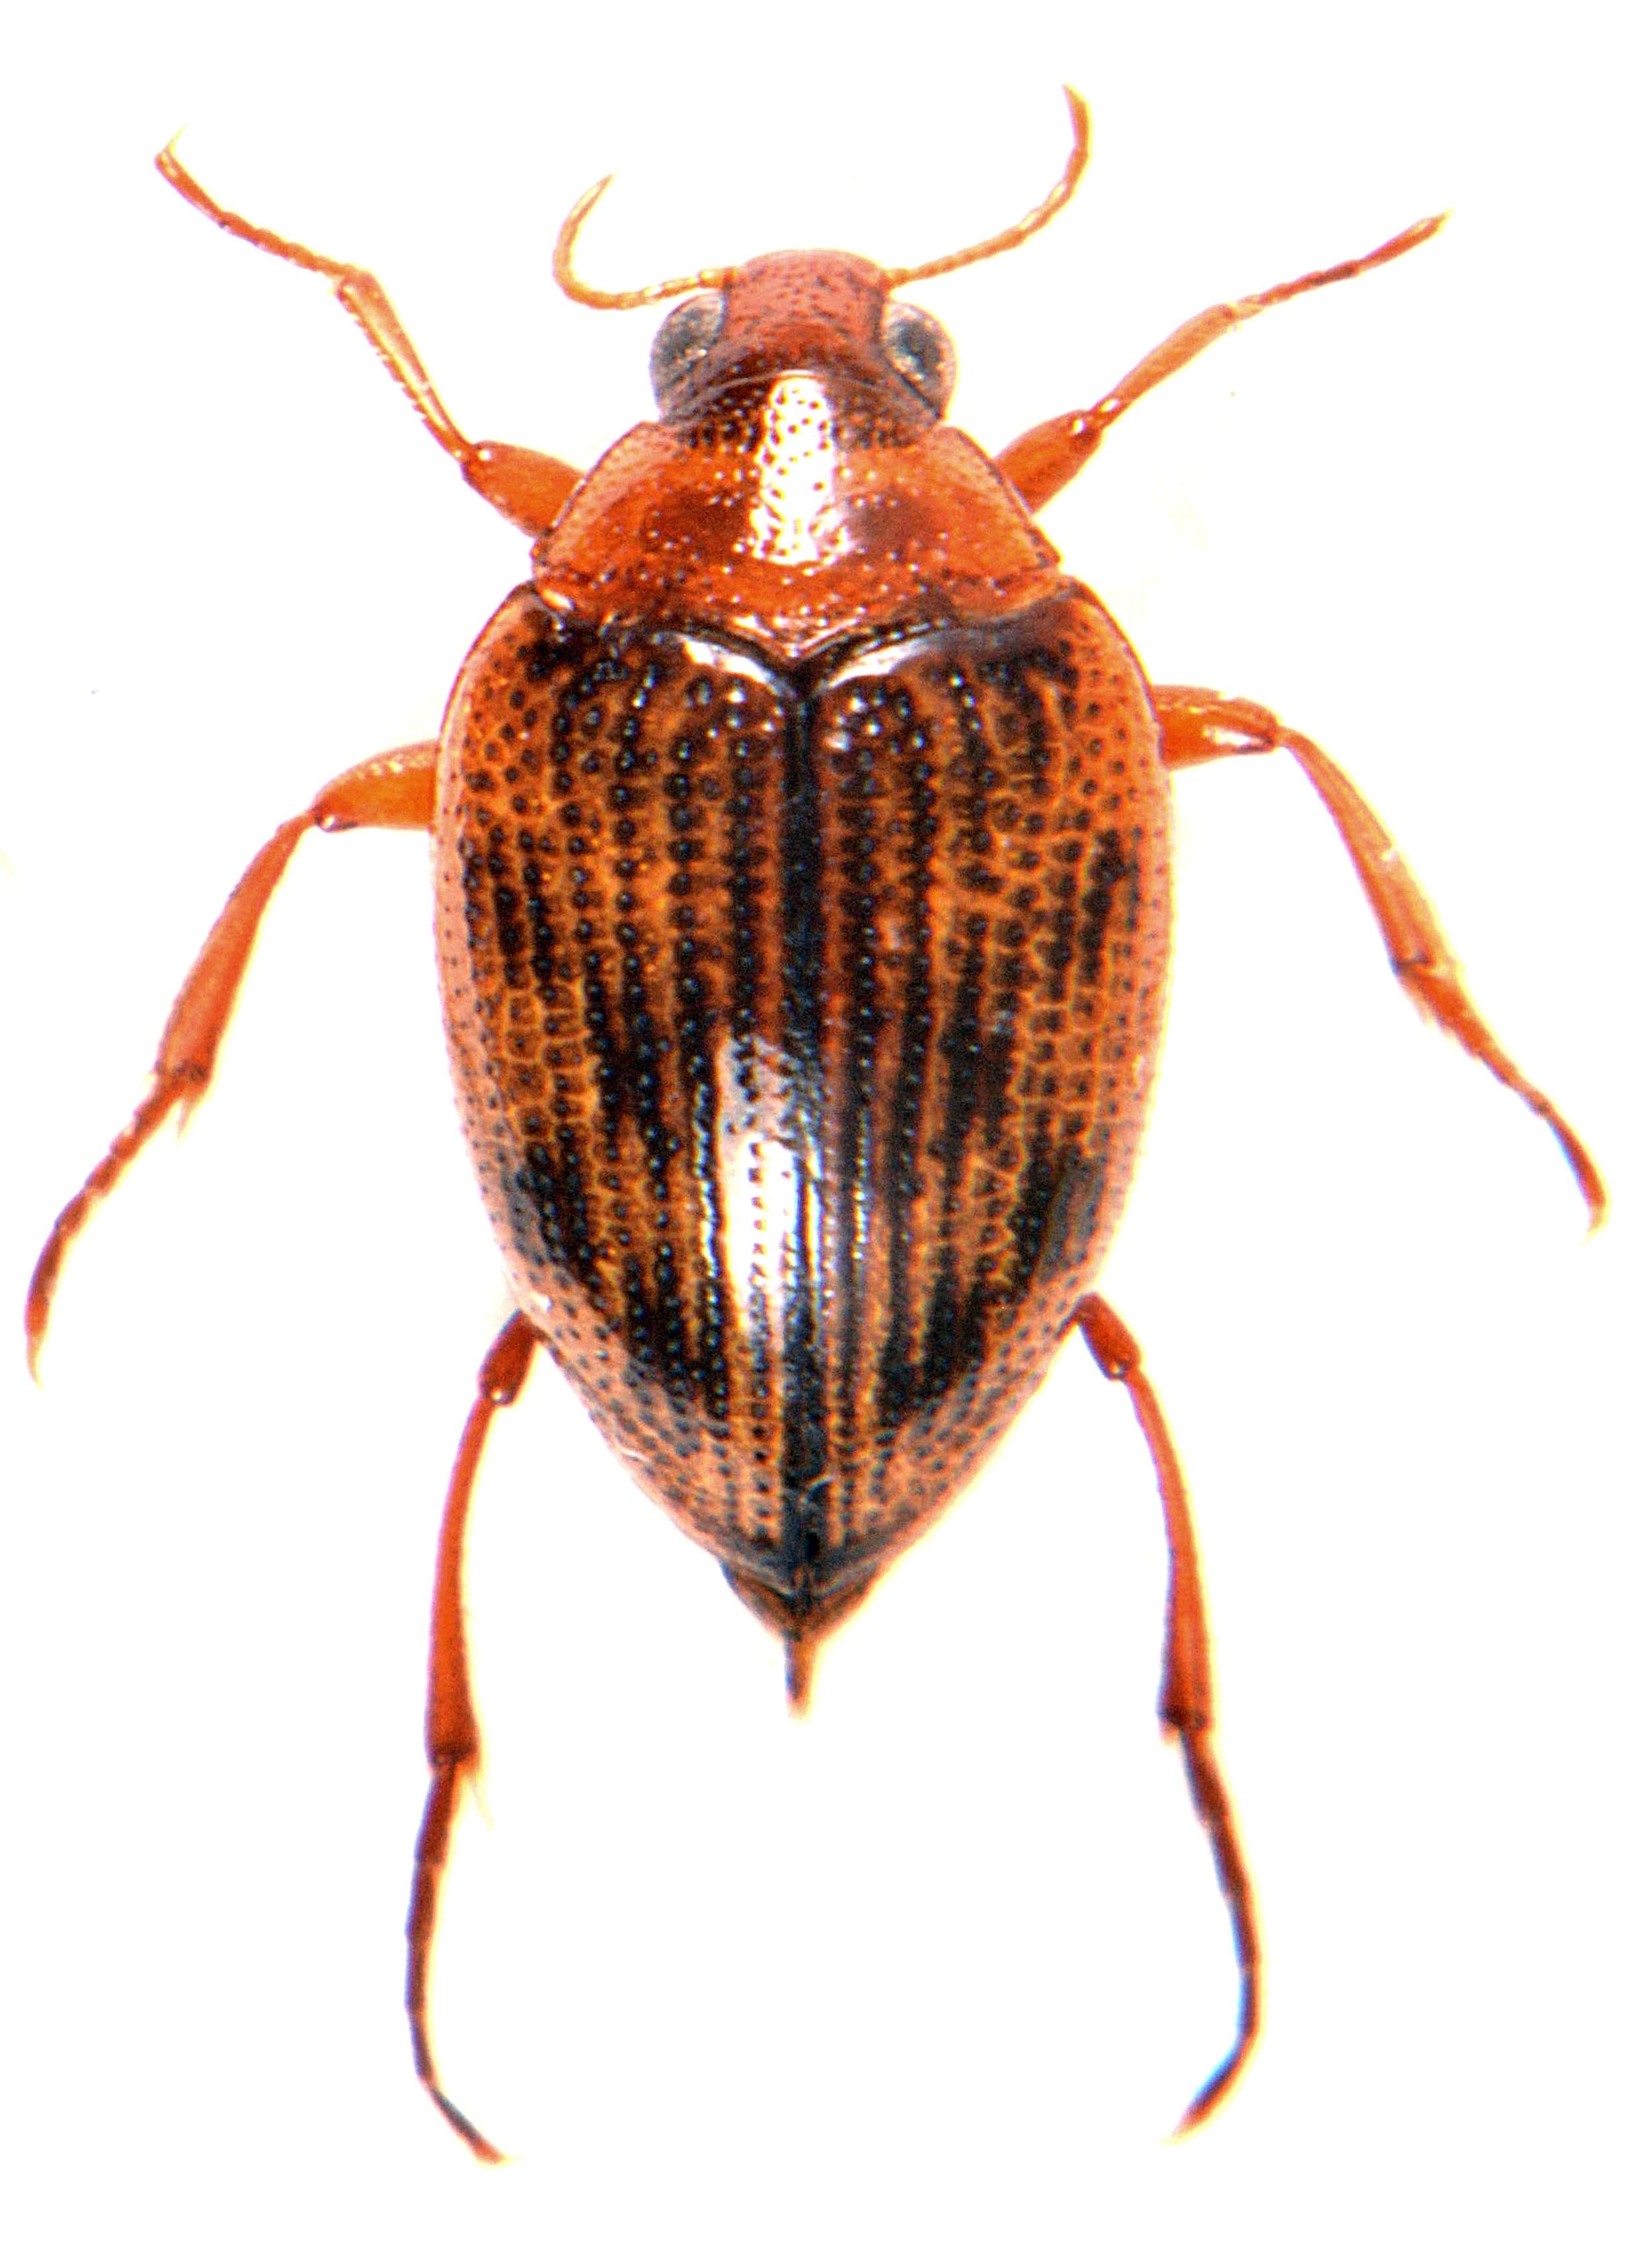 Haliplus ruficollis 1